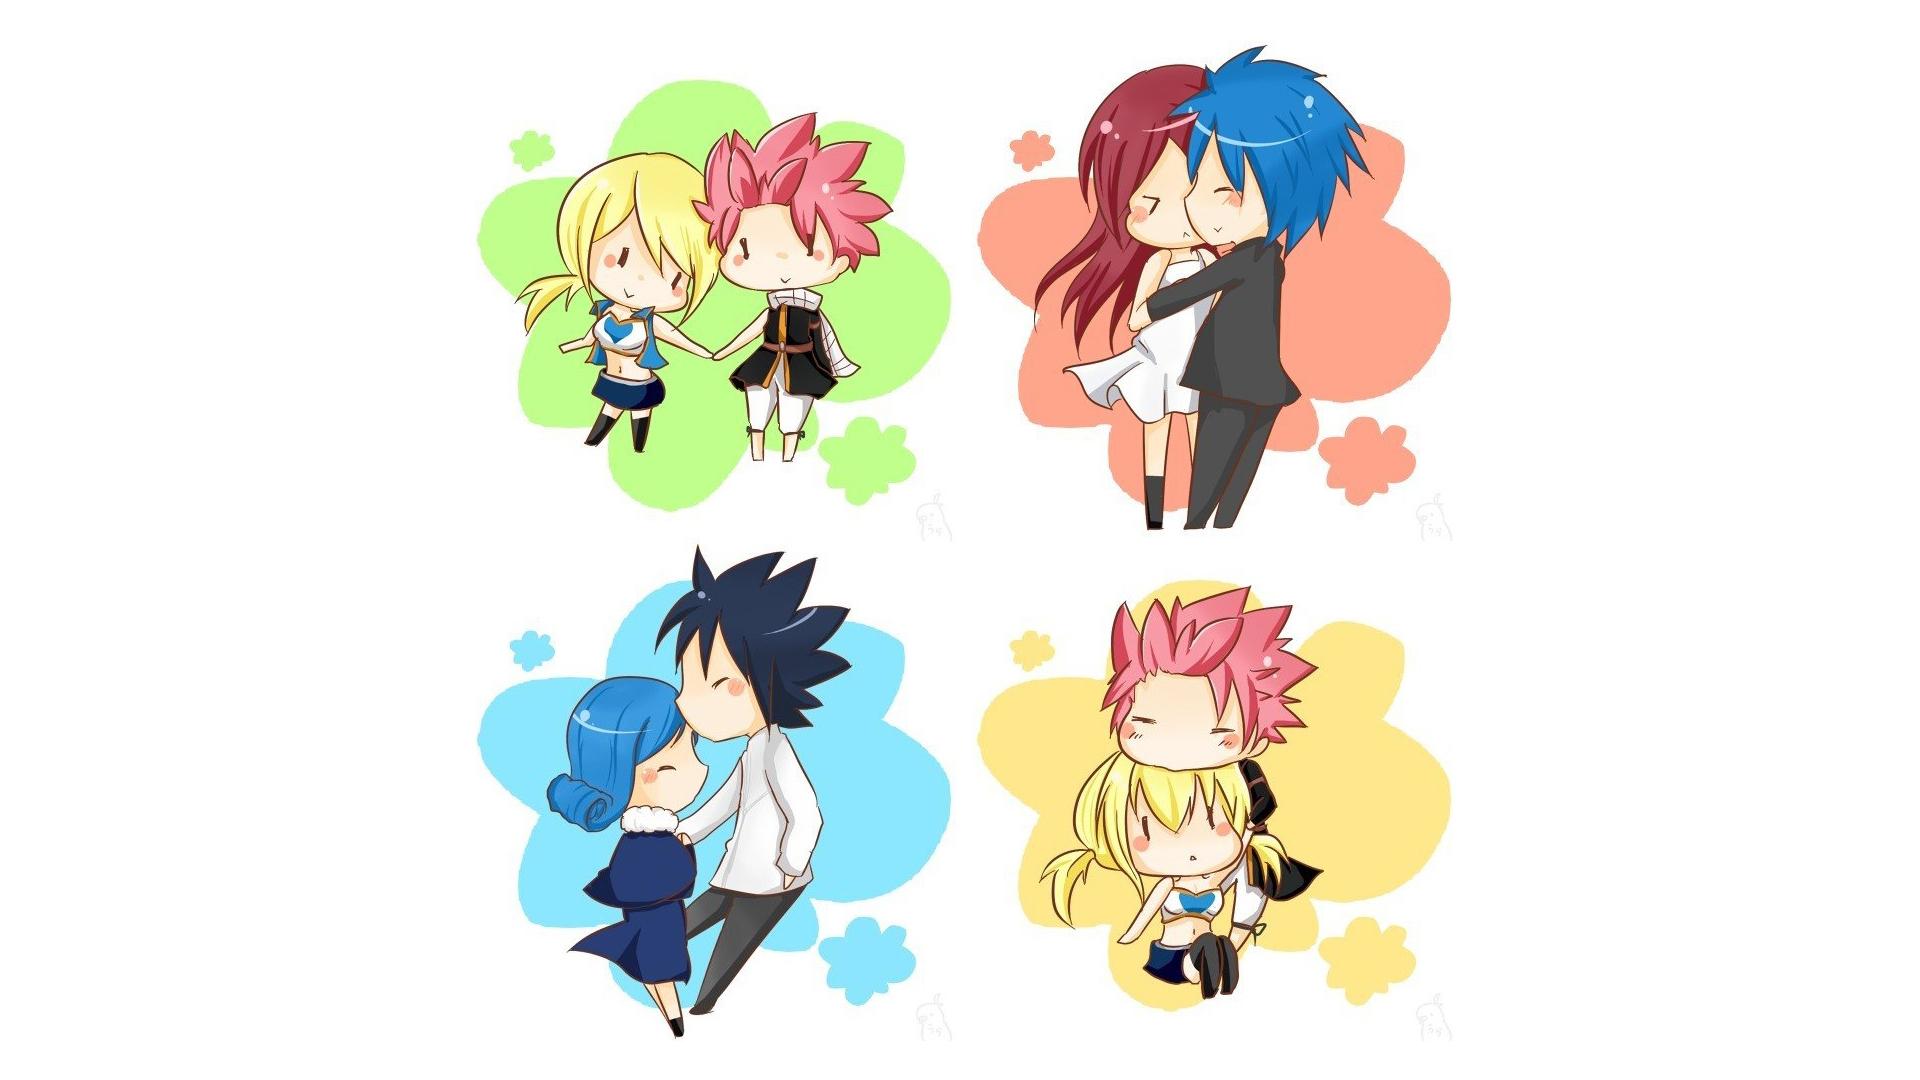 Anime Chibi Fairy Tail 0l Wallpaper HD